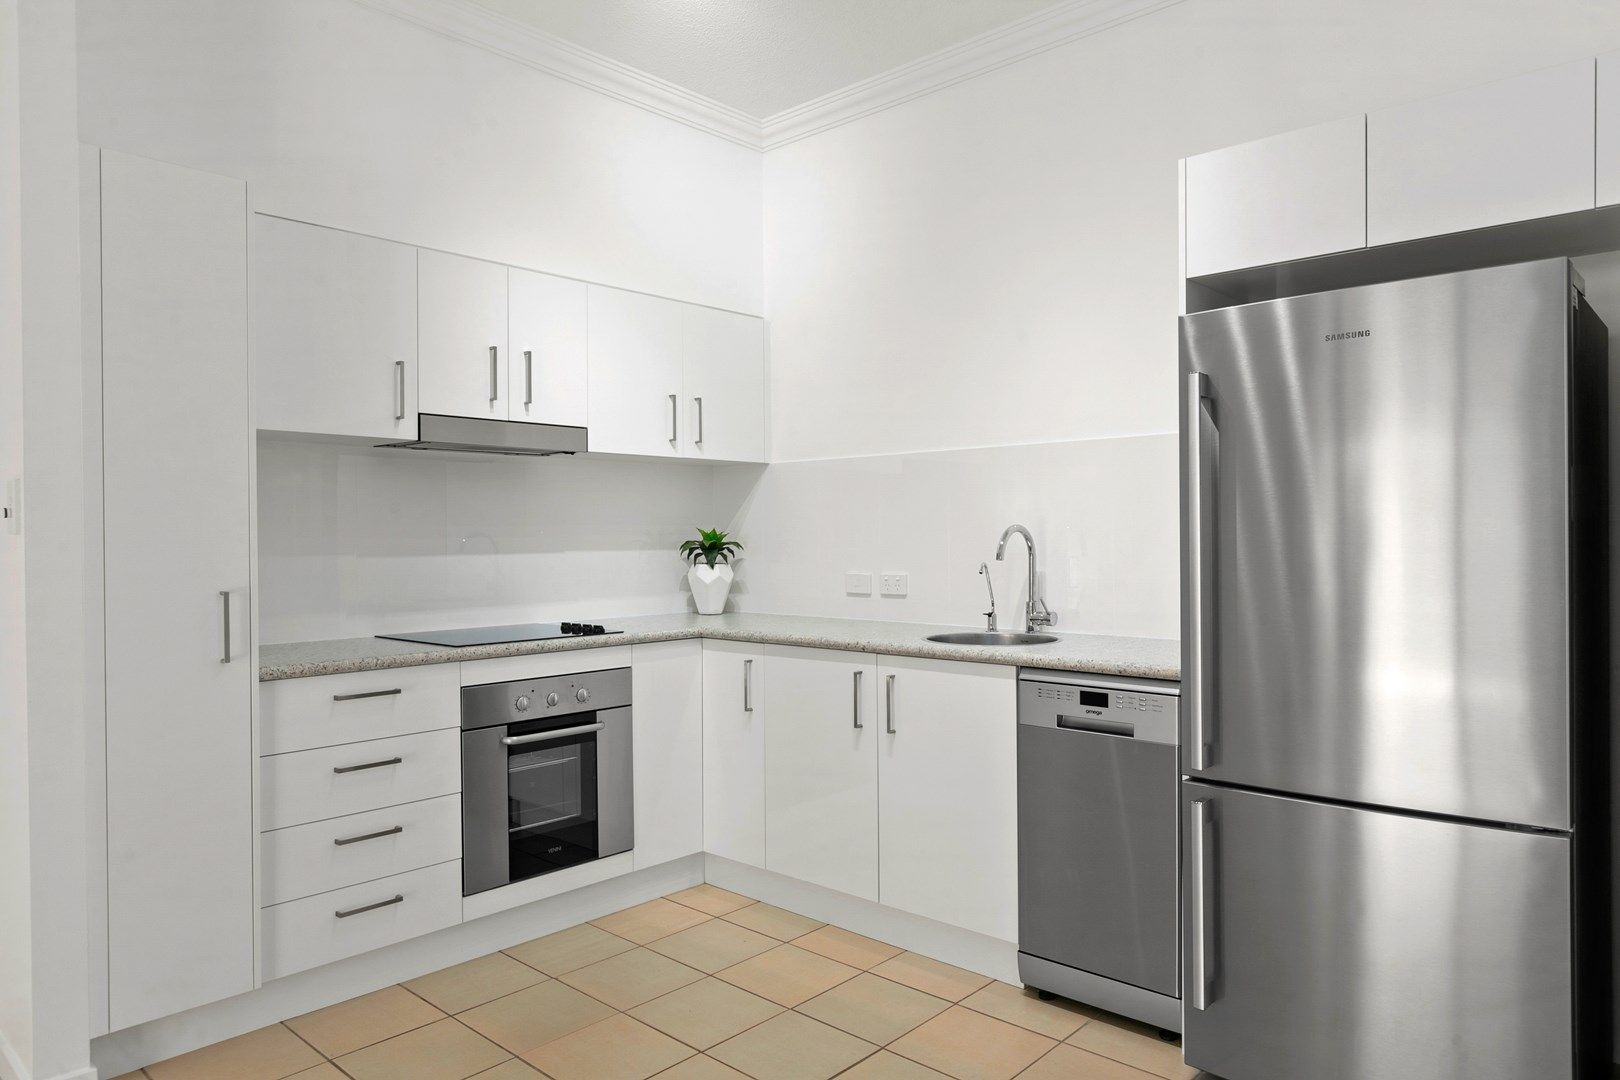 218/53-57 Clifton Road, Clifton Beach QLD 4879, Image 0